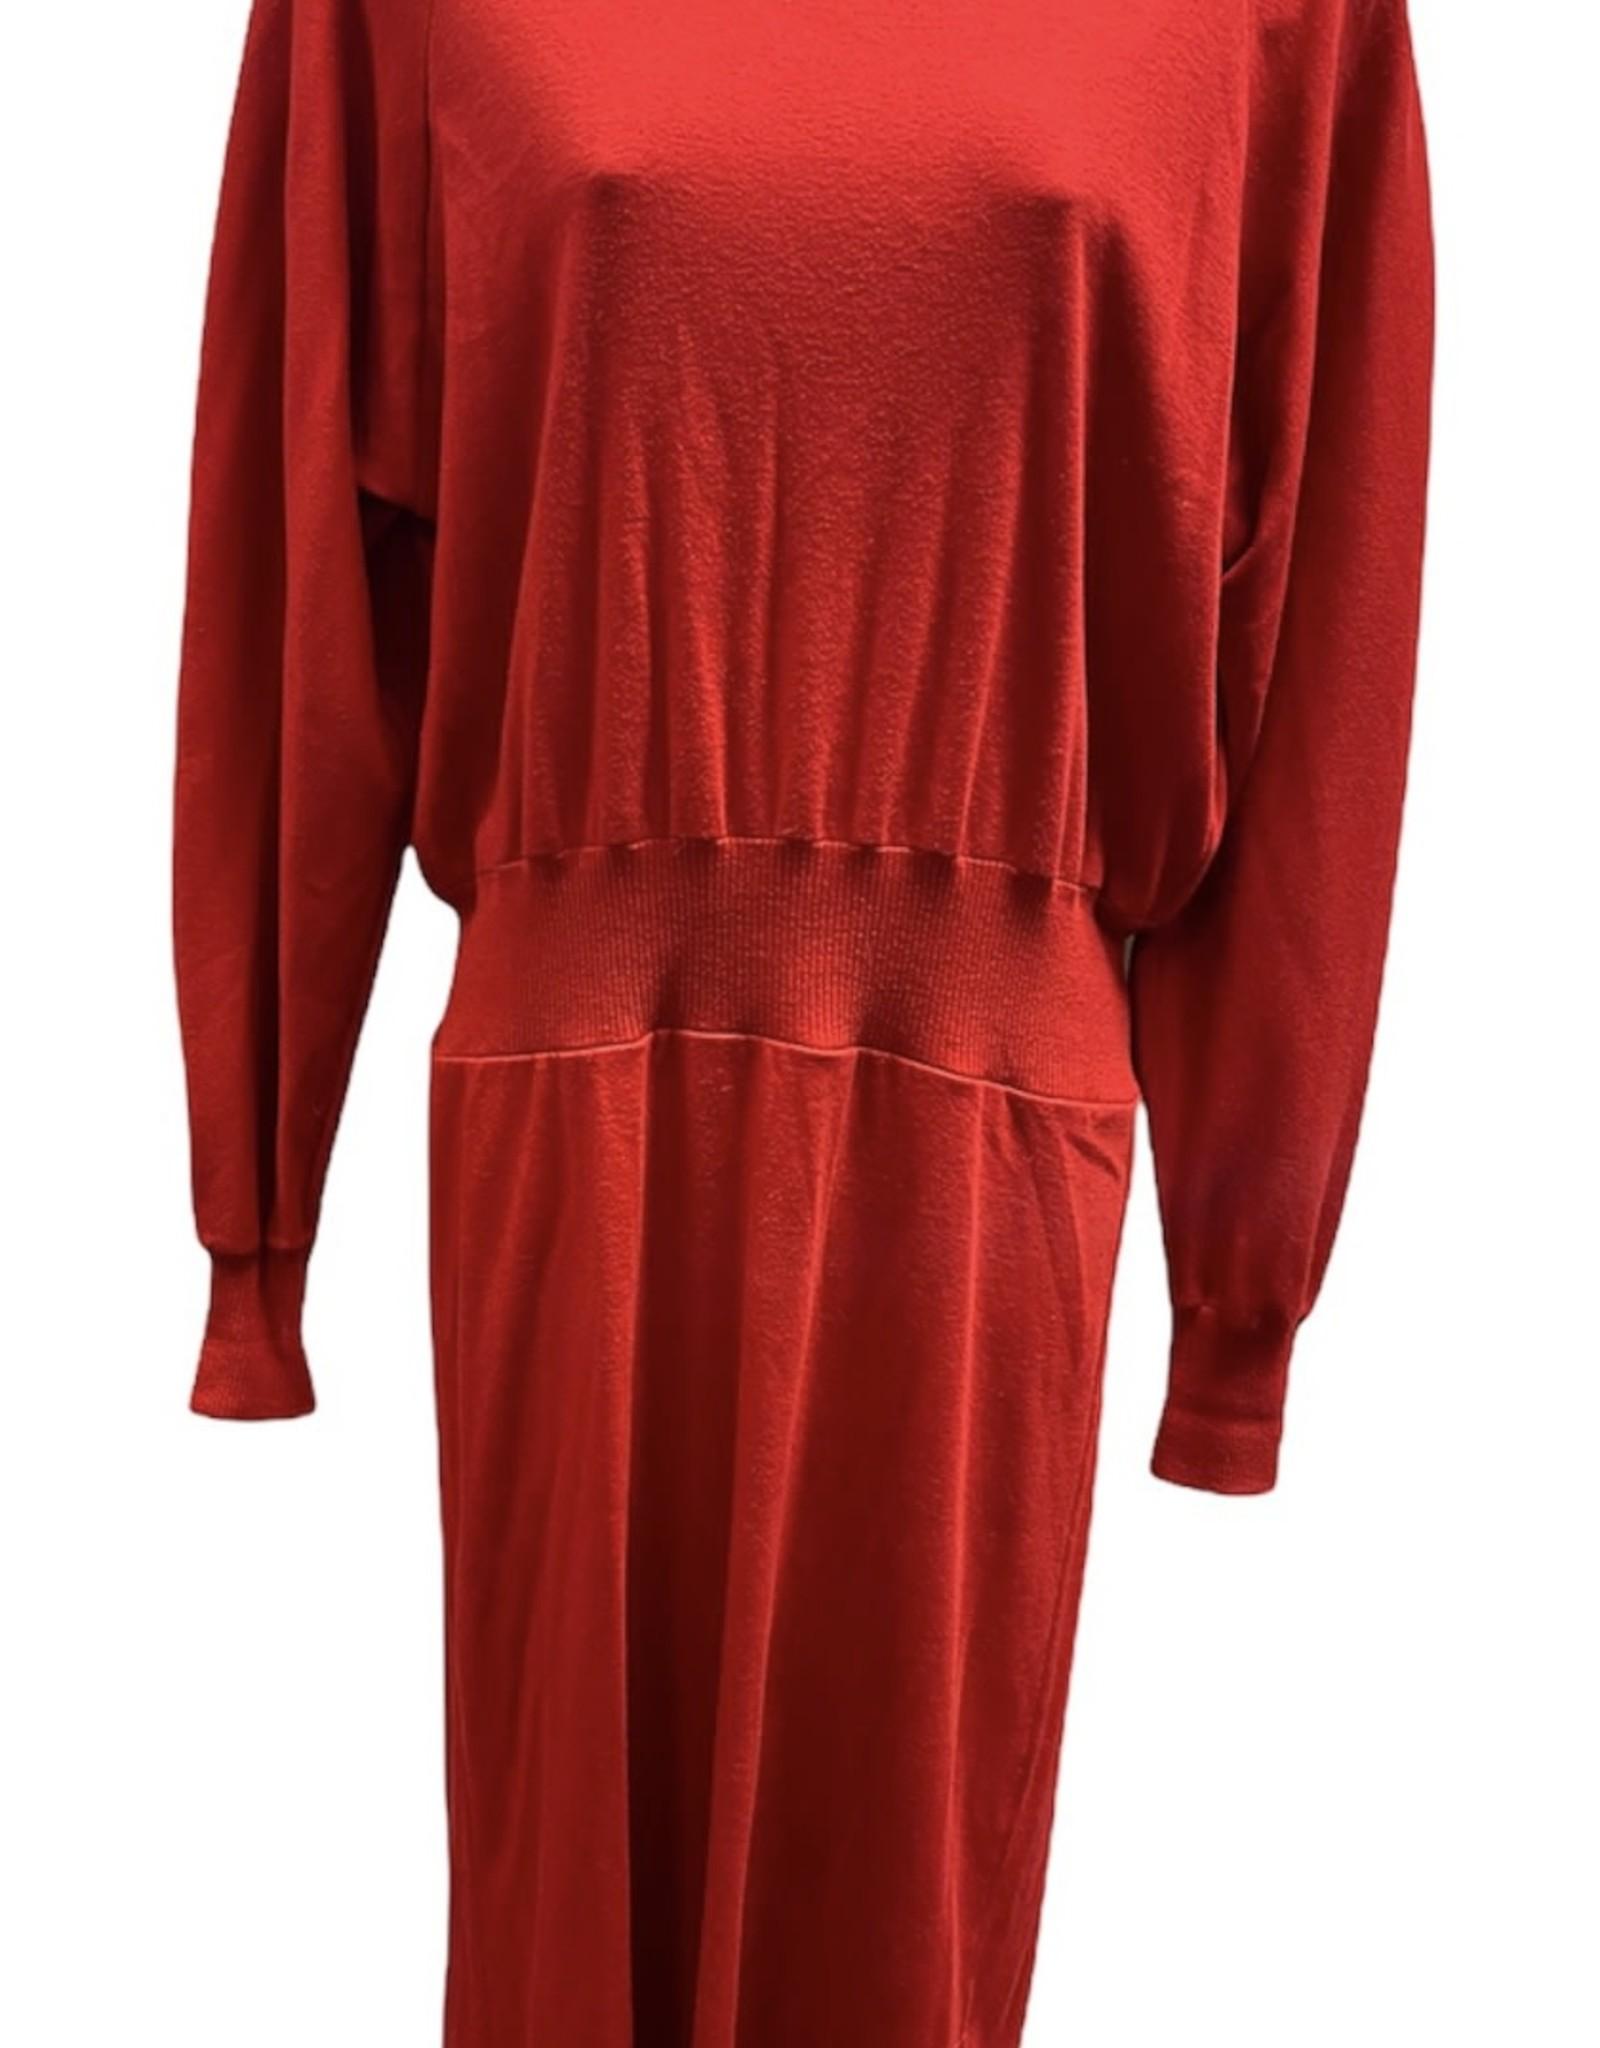 80s knit red dress